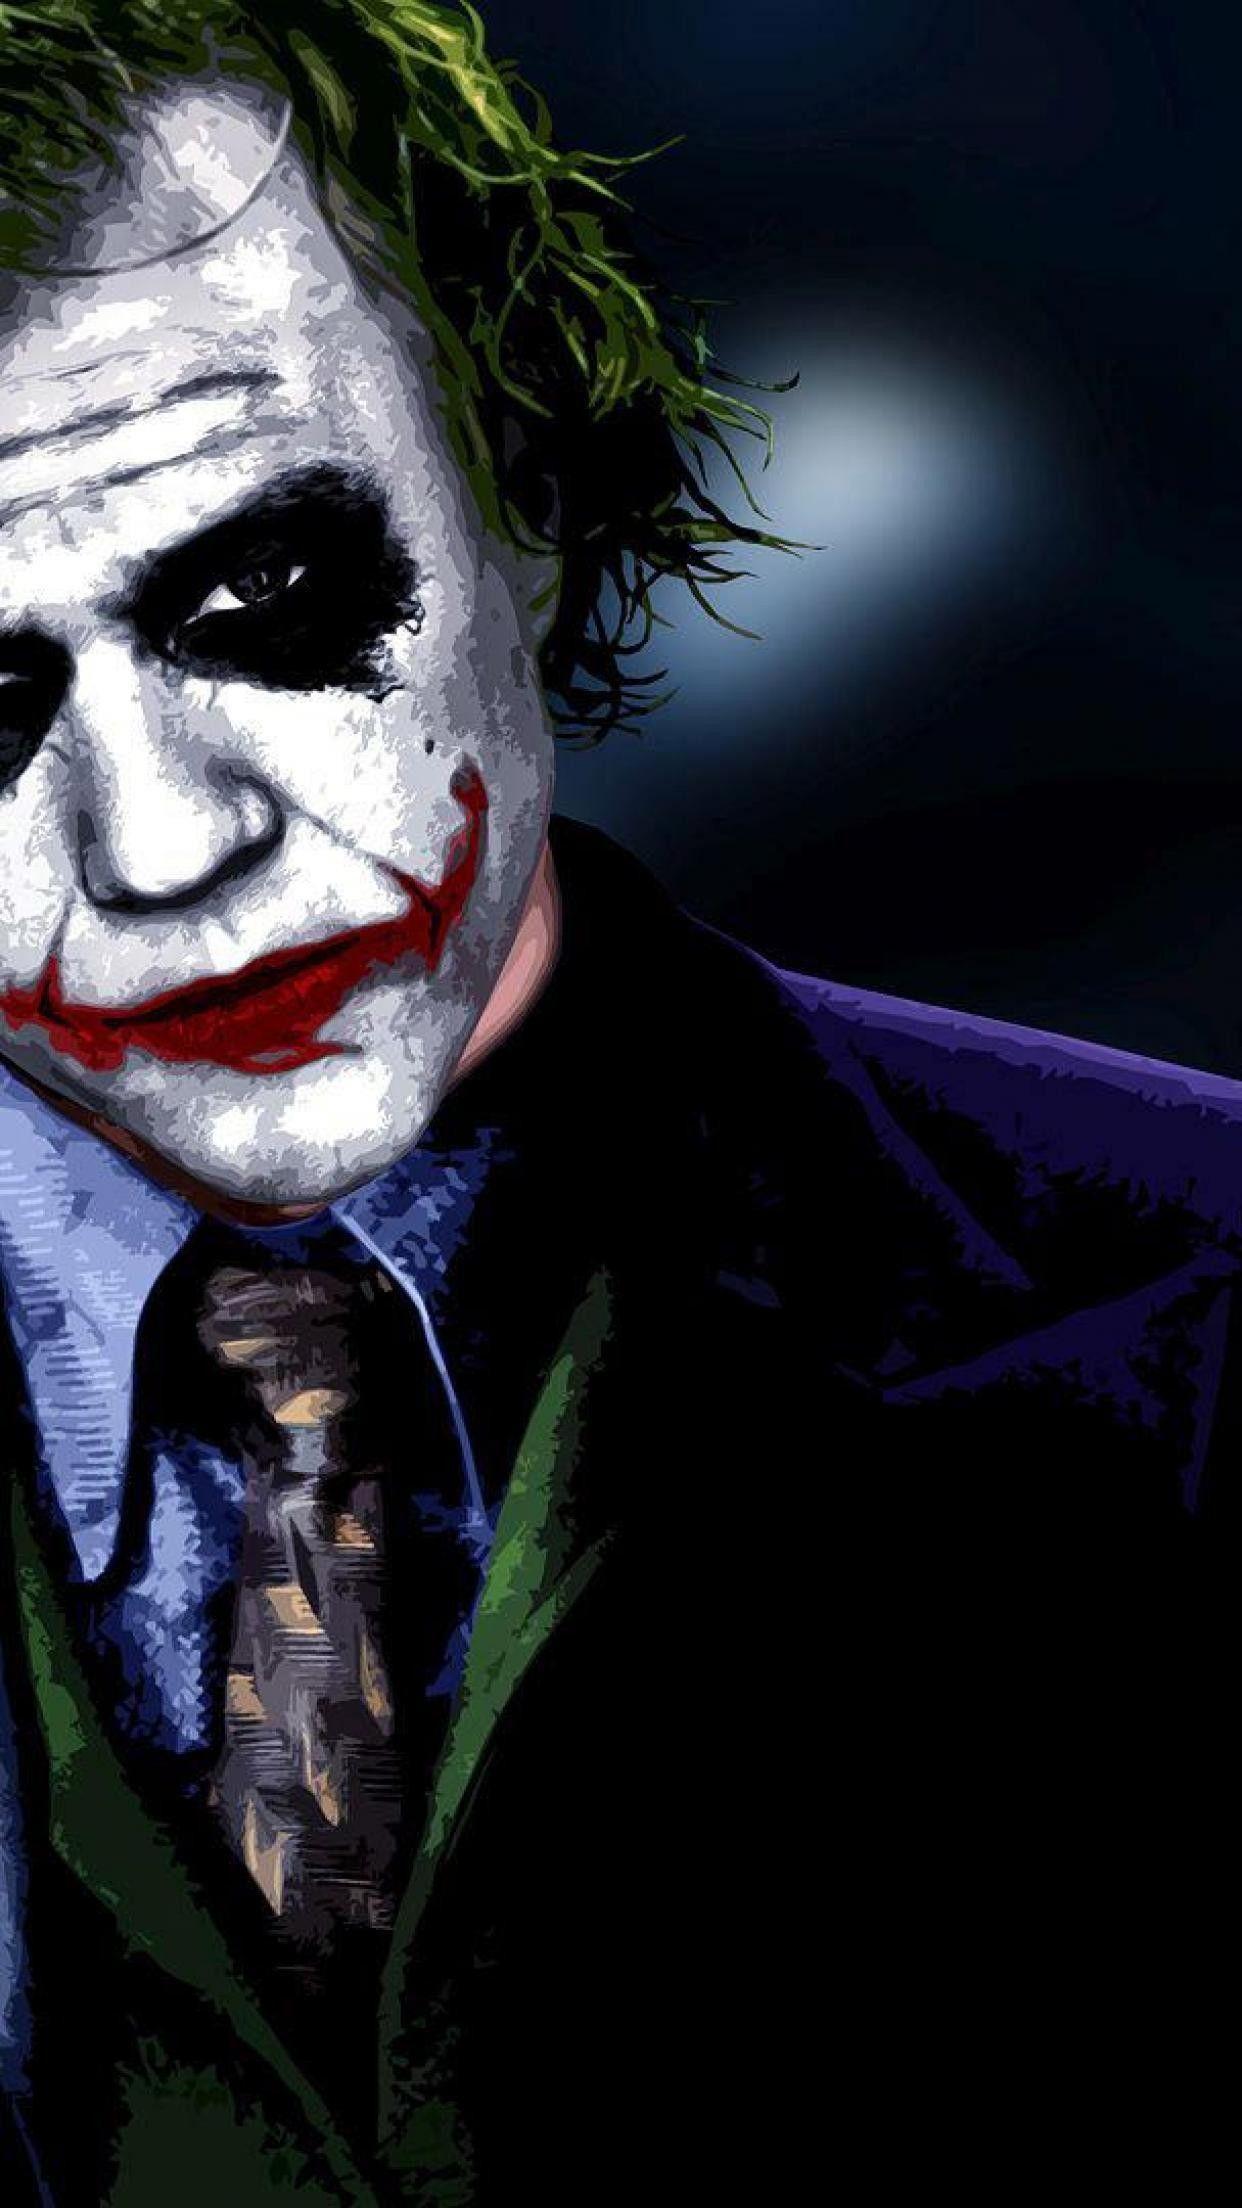 Joker Cell Phone Wallpapers Top Free Joker Cell Phone Backgrounds